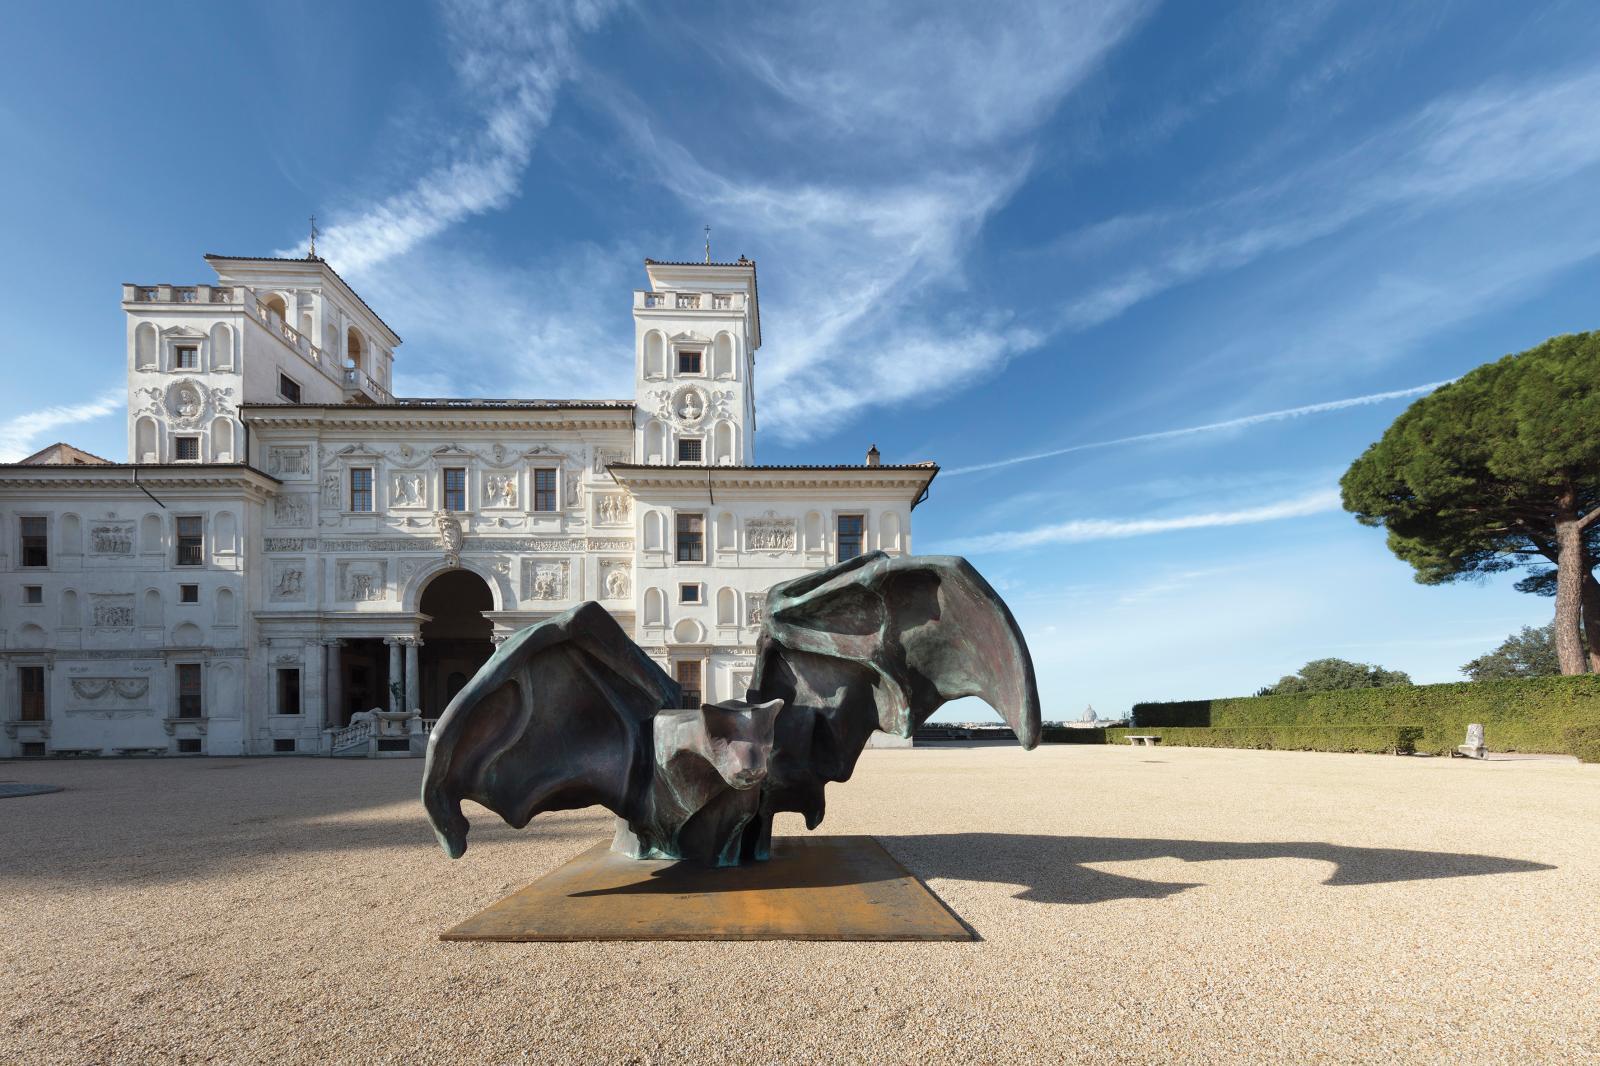 Johan Creten, exposition «I Peccati» à la villa Médicis, 2020. © Académie de France à Rome - Villa Médicis